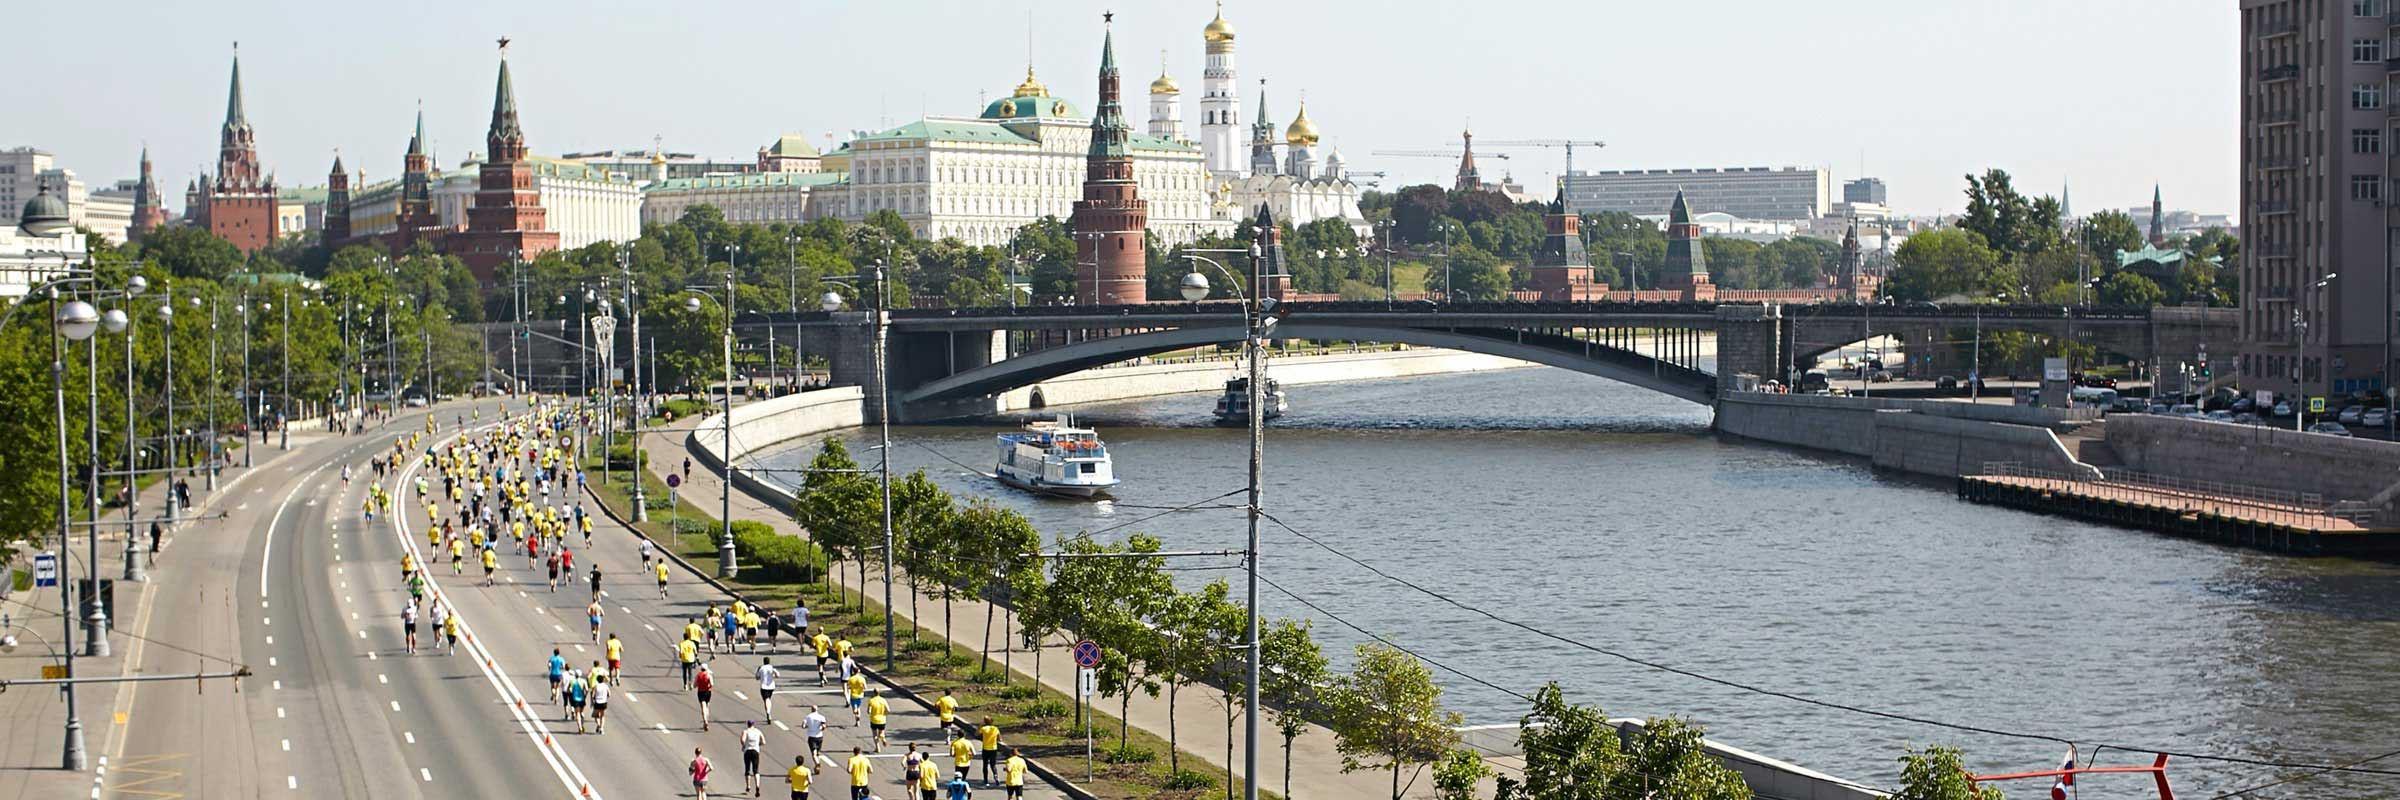 bDMIFc_moscow-marathon-1